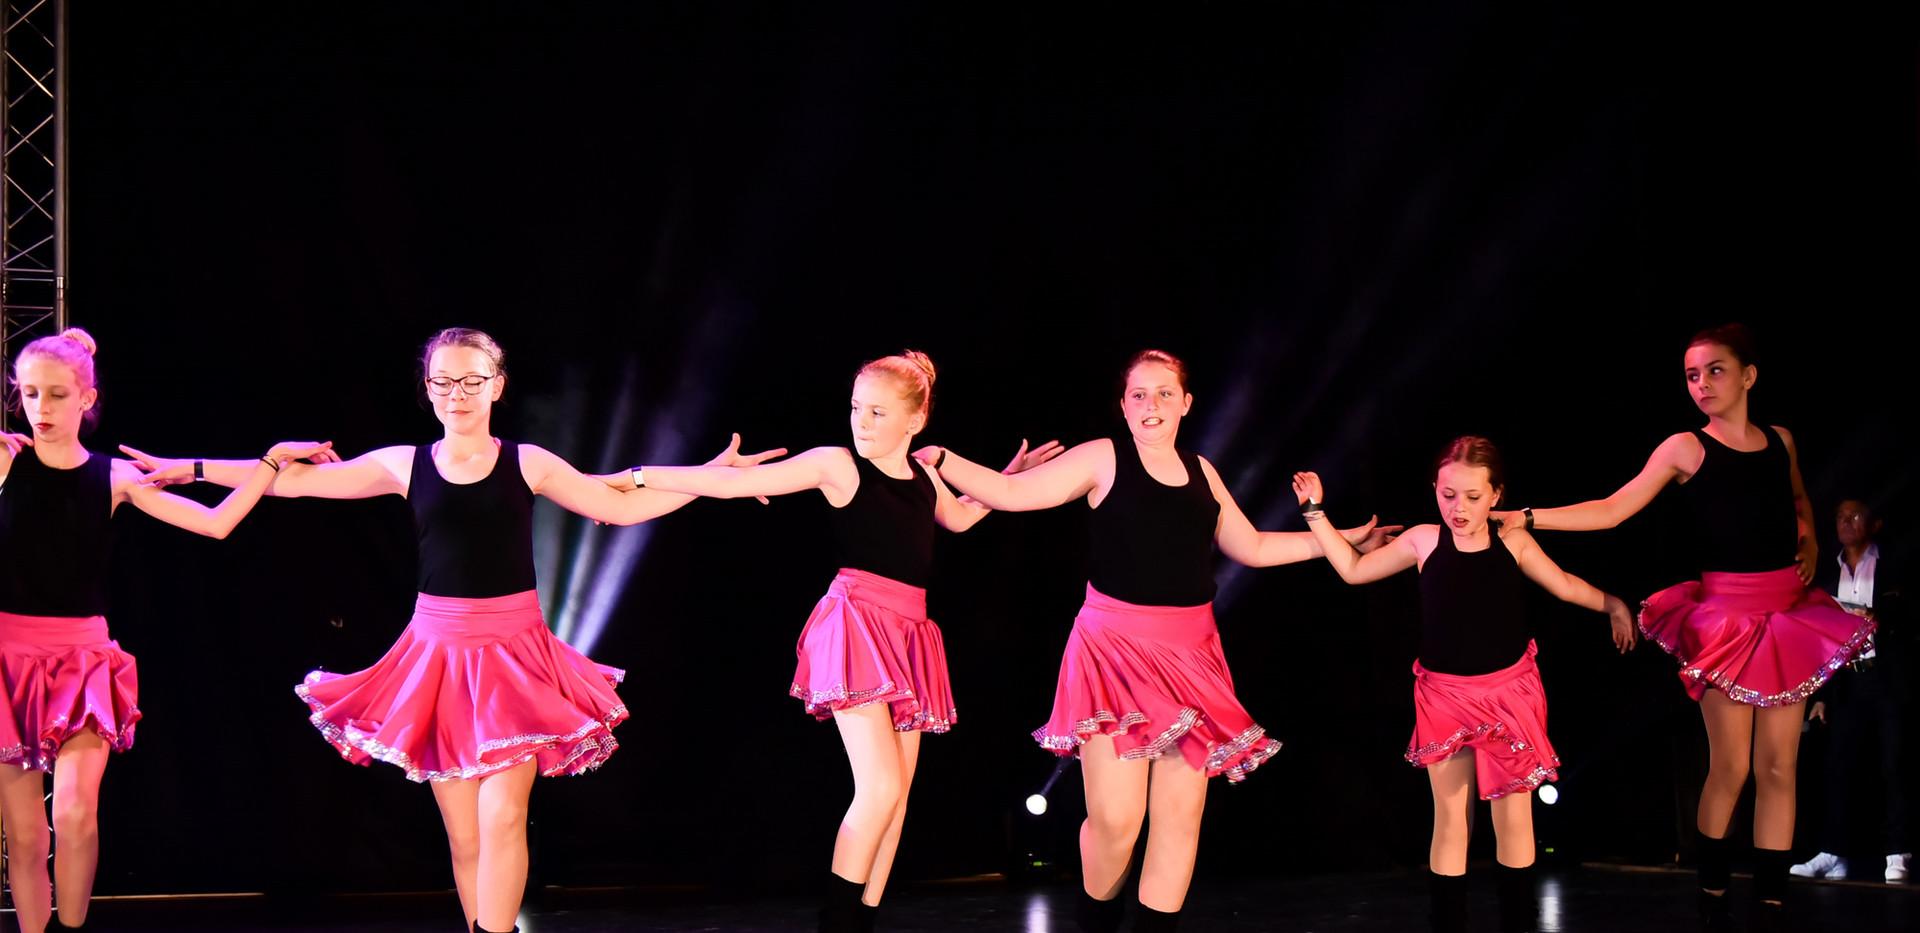 DANCE SHOW 19 - Foma Rock Girls (15)_GF.